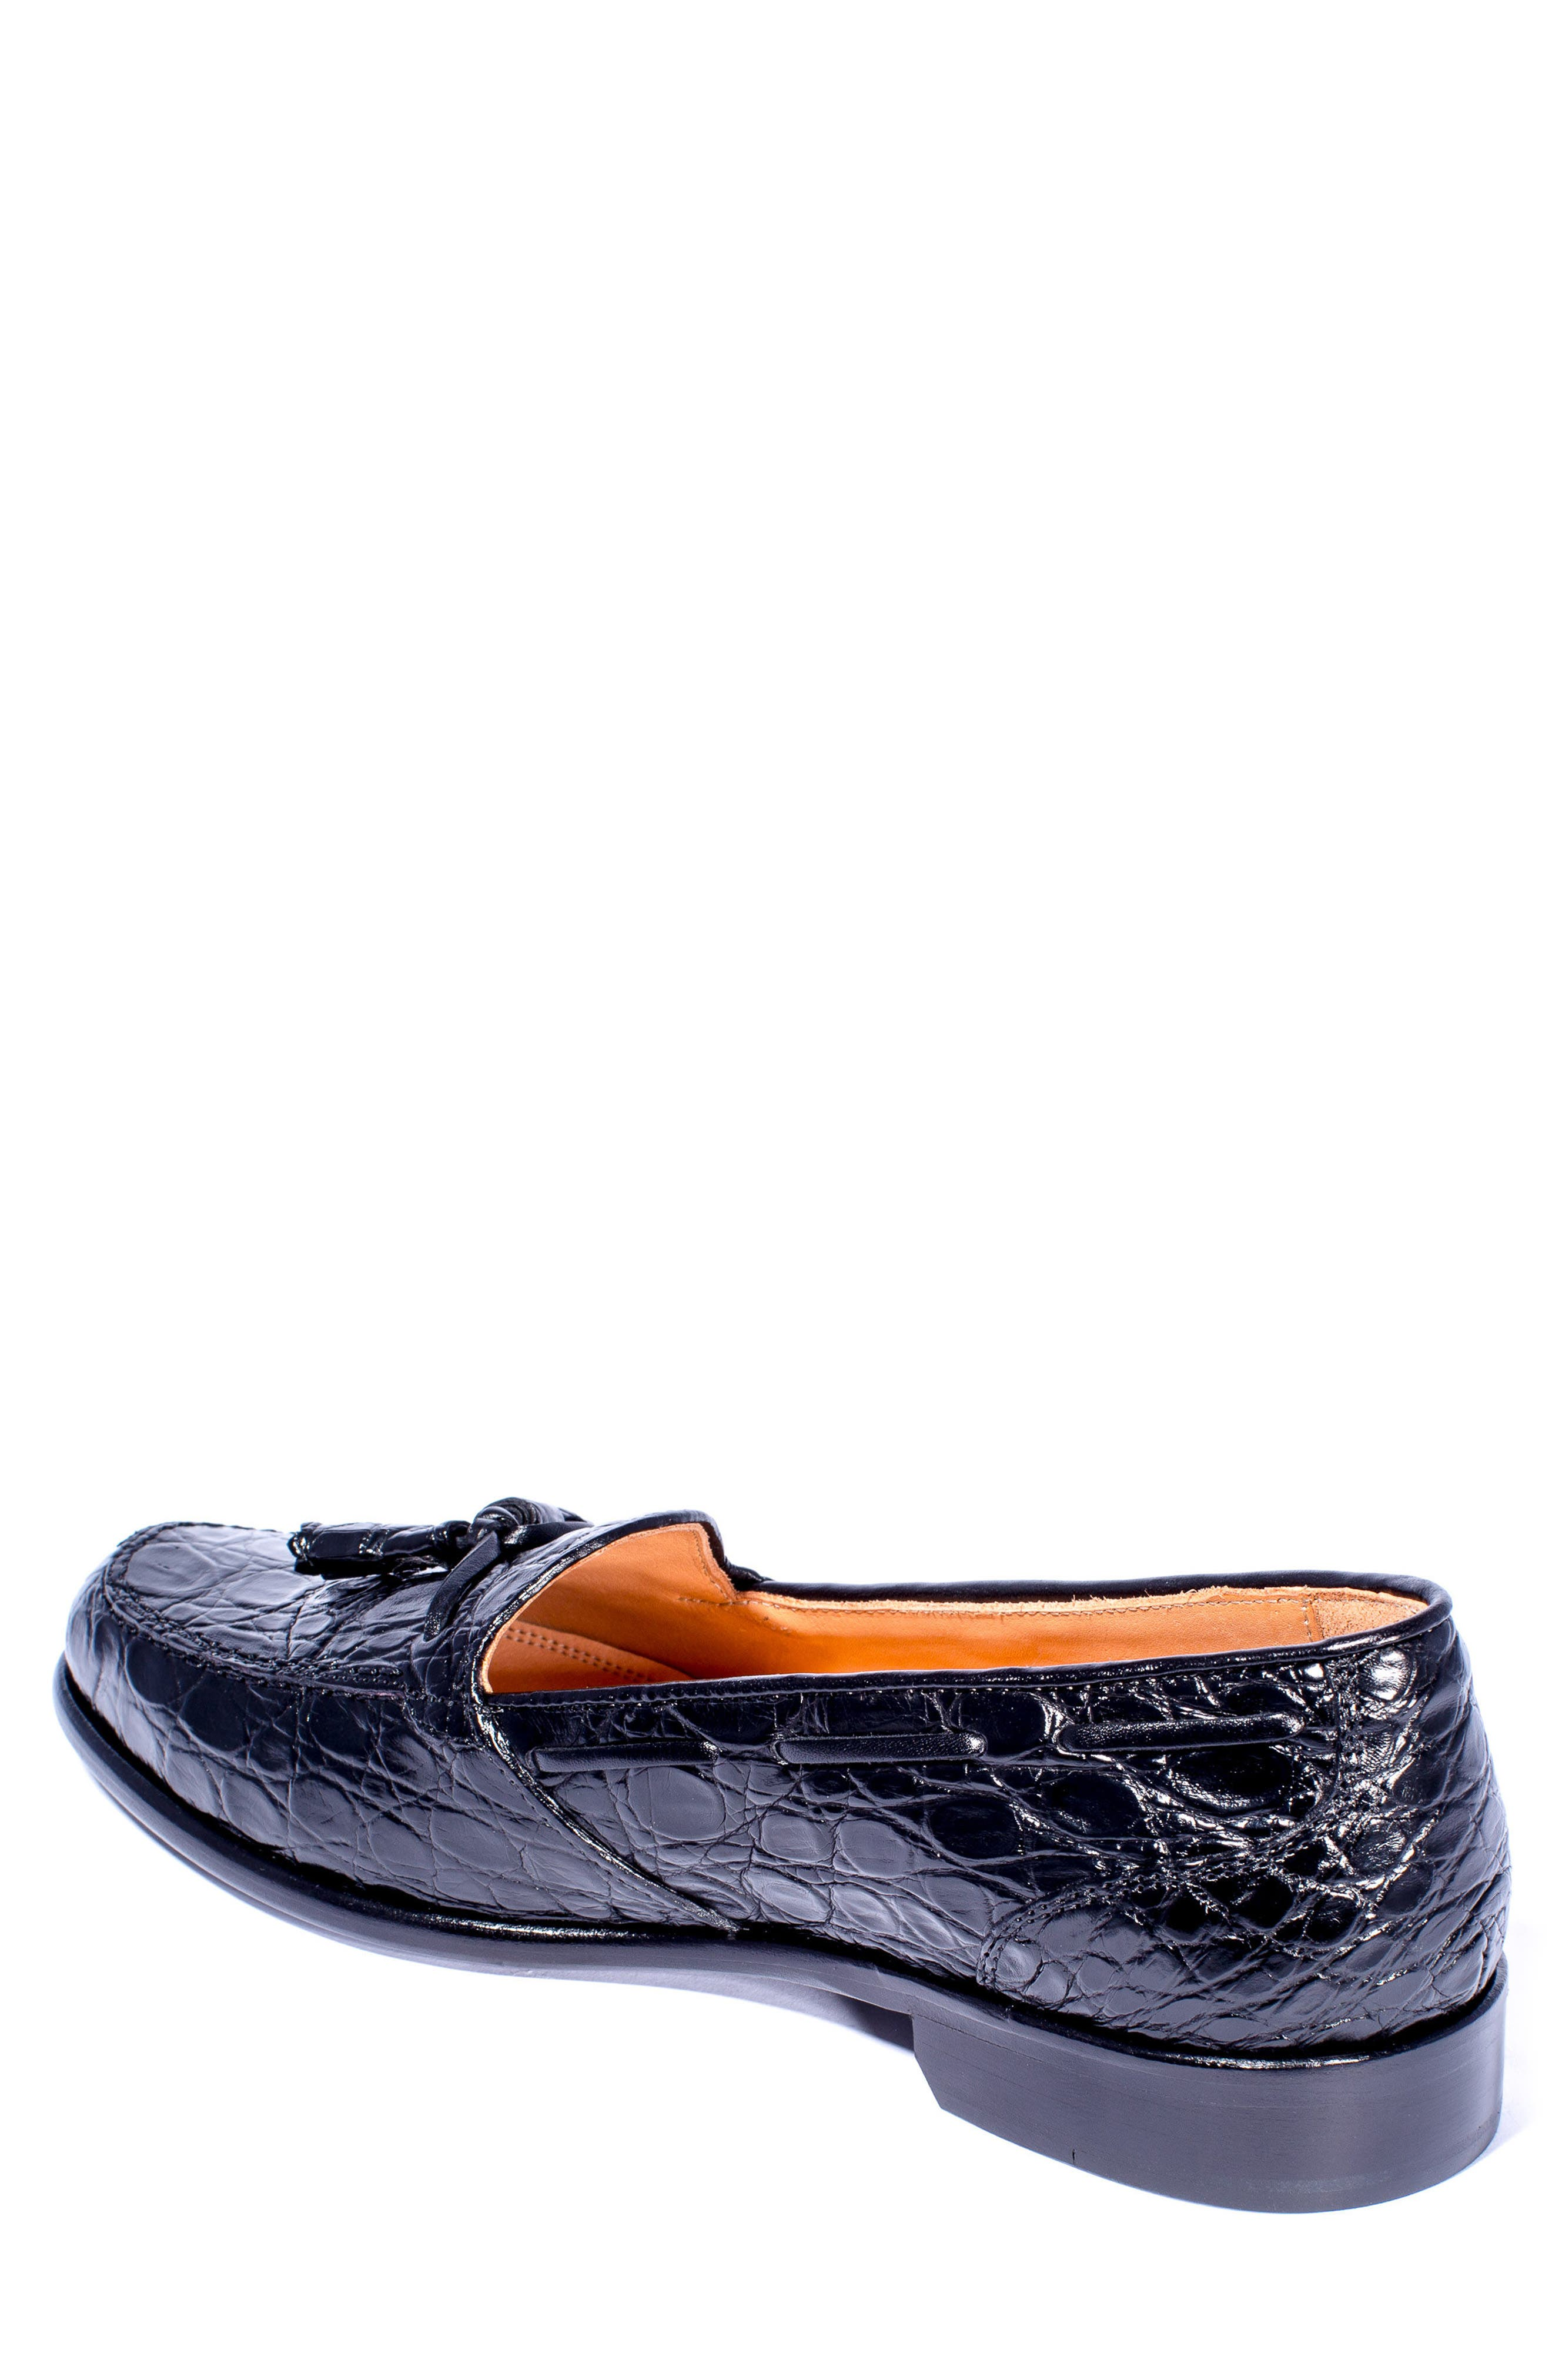 Franco Tassel Exotic Leather Loafer,                             Alternate thumbnail 2, color,                             001